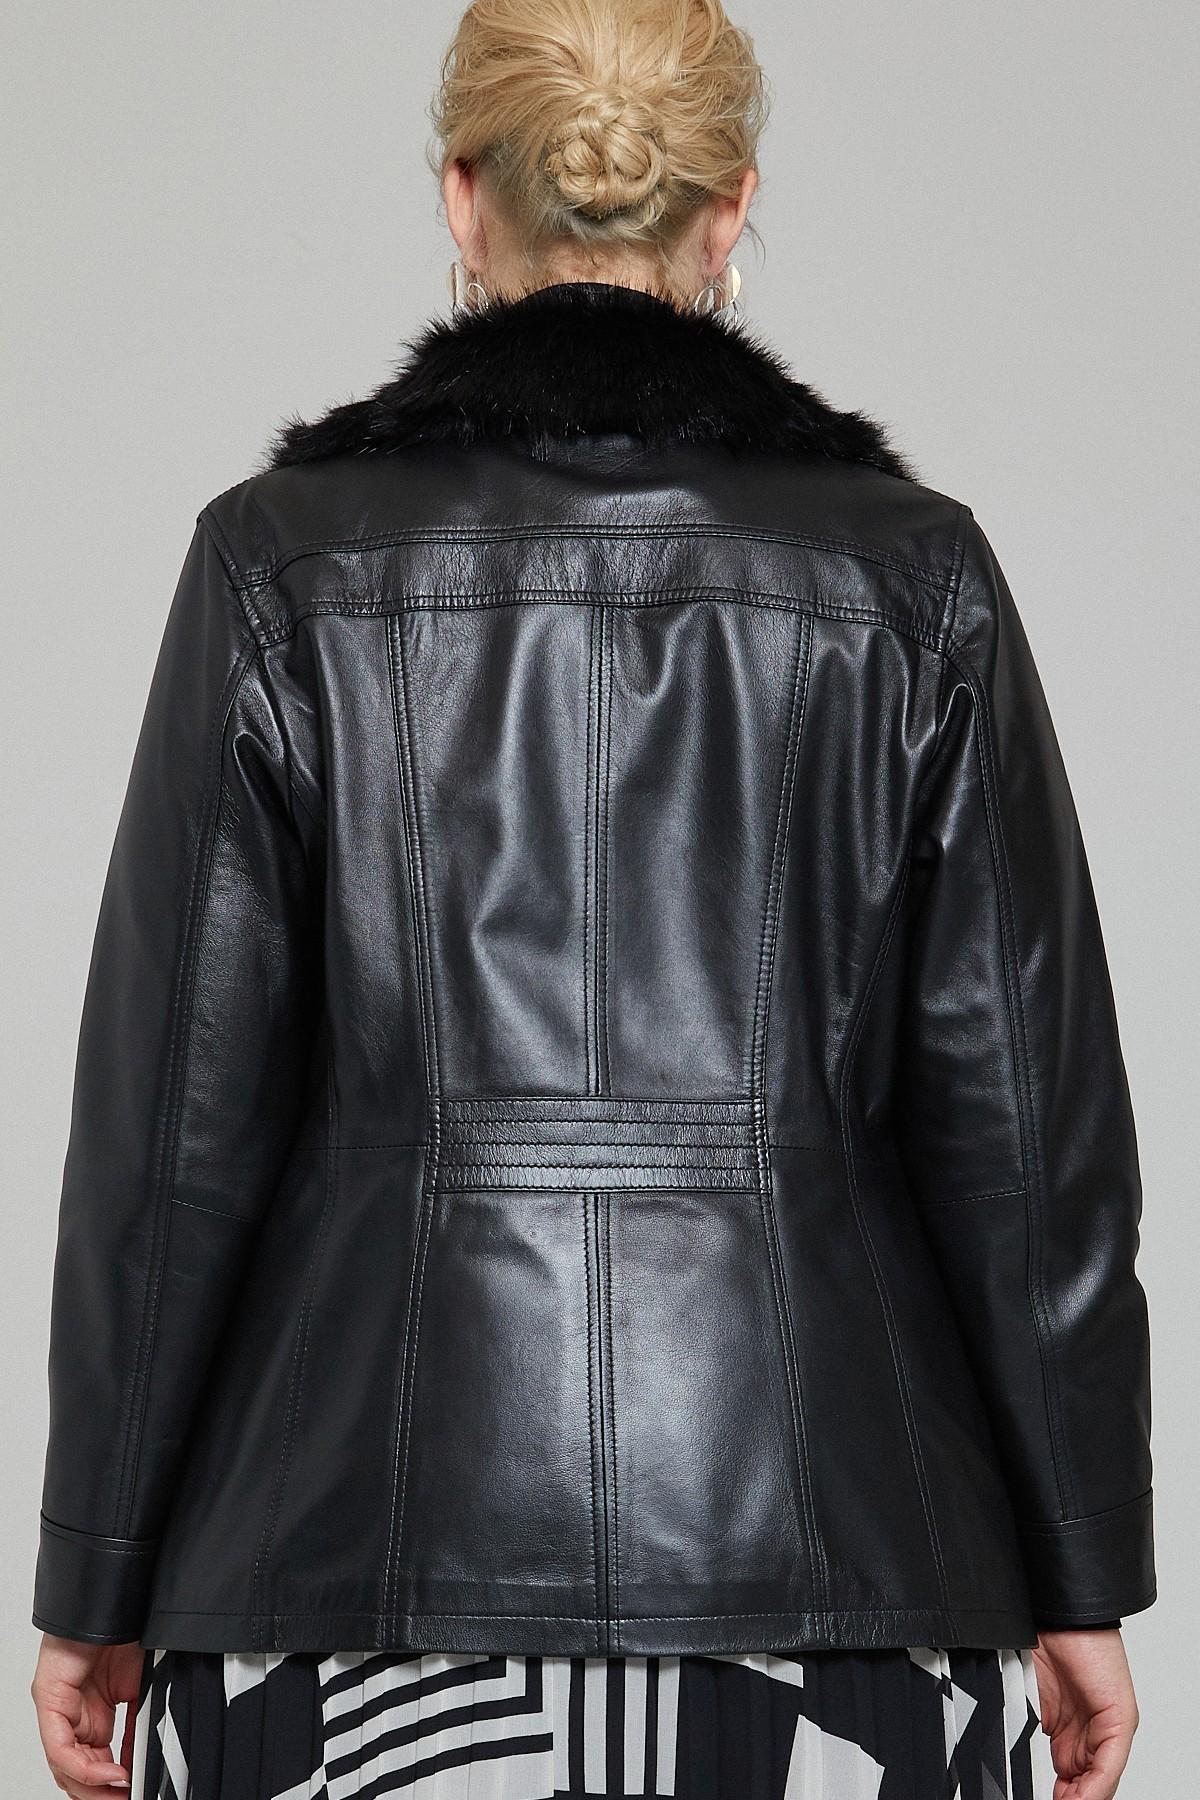 Paul Smith Leather Jacket Womens